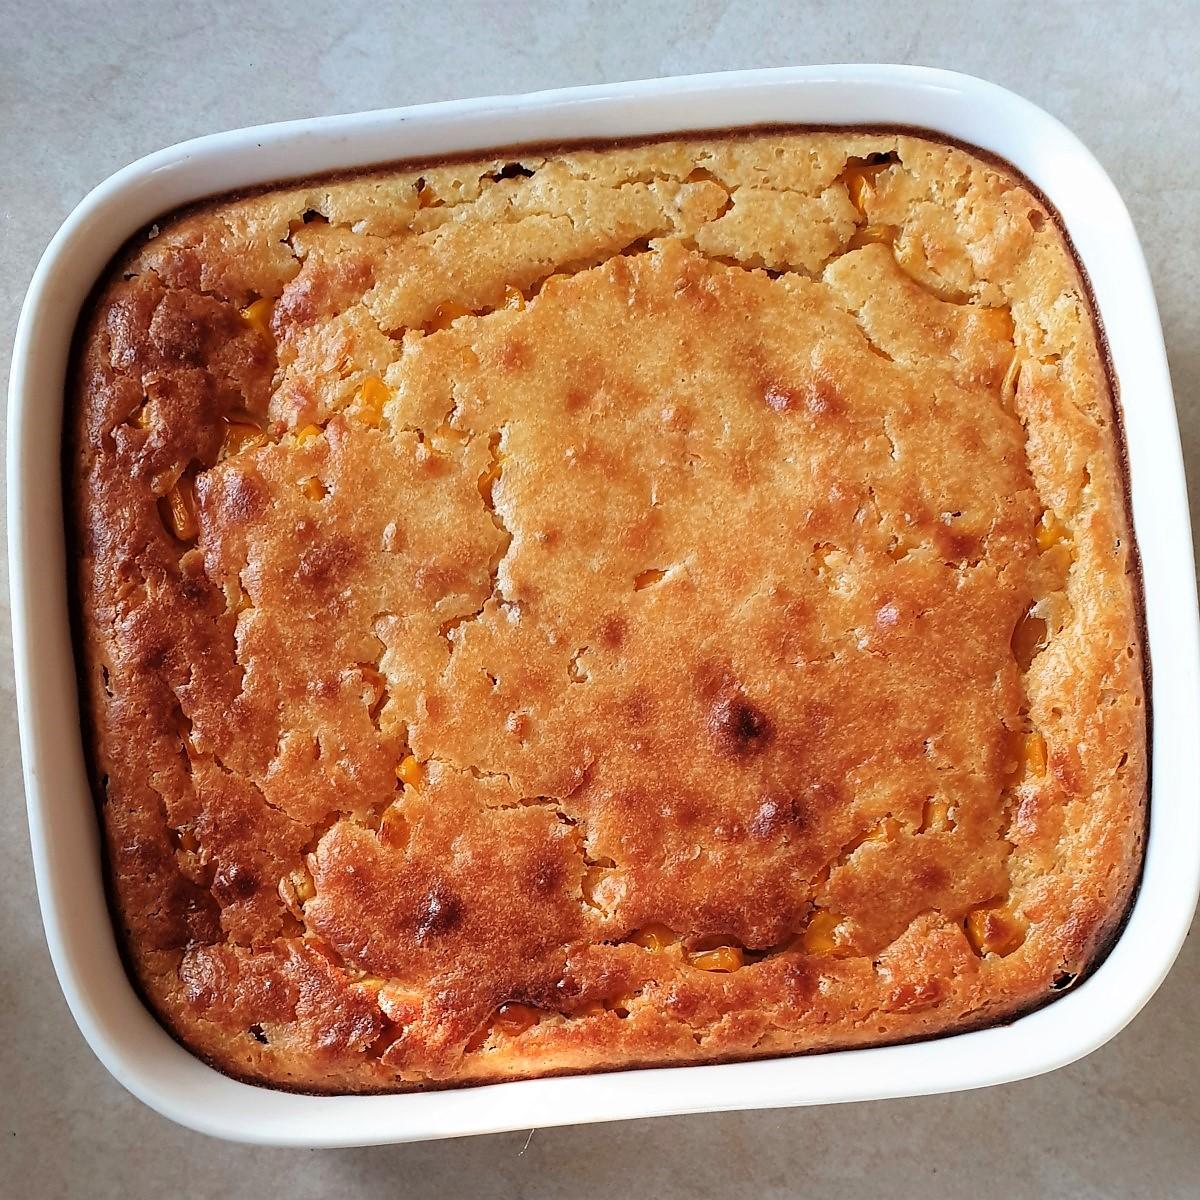 A dish of baked cornbread casserole.